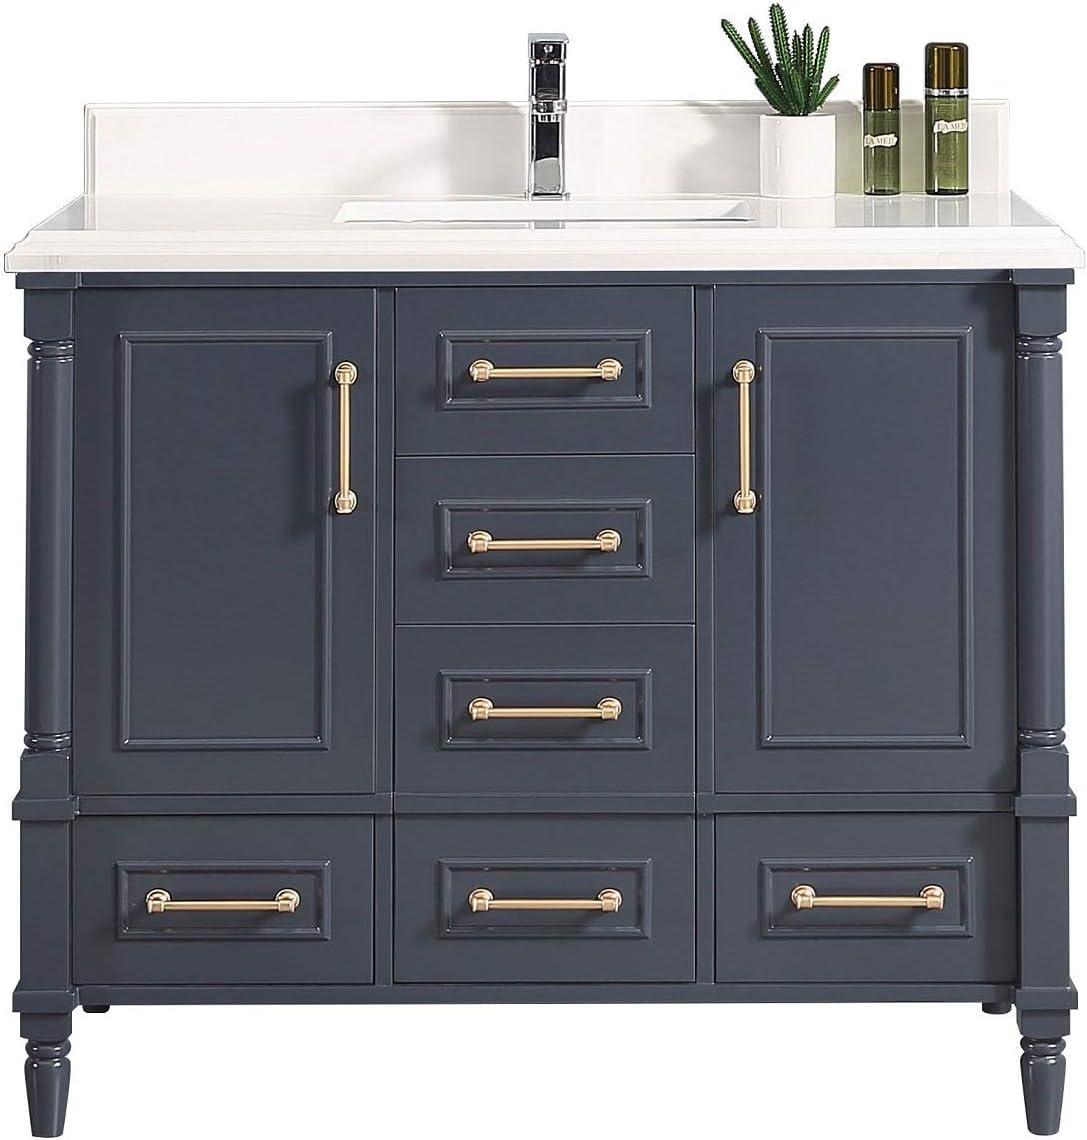 Amazon Com 48 X 22 Willow Collections Aberdeen Bathroom Vanity In Hale Navy Blue With 4cm Beveled Edge Calacatta Quartz Kitchen Dining